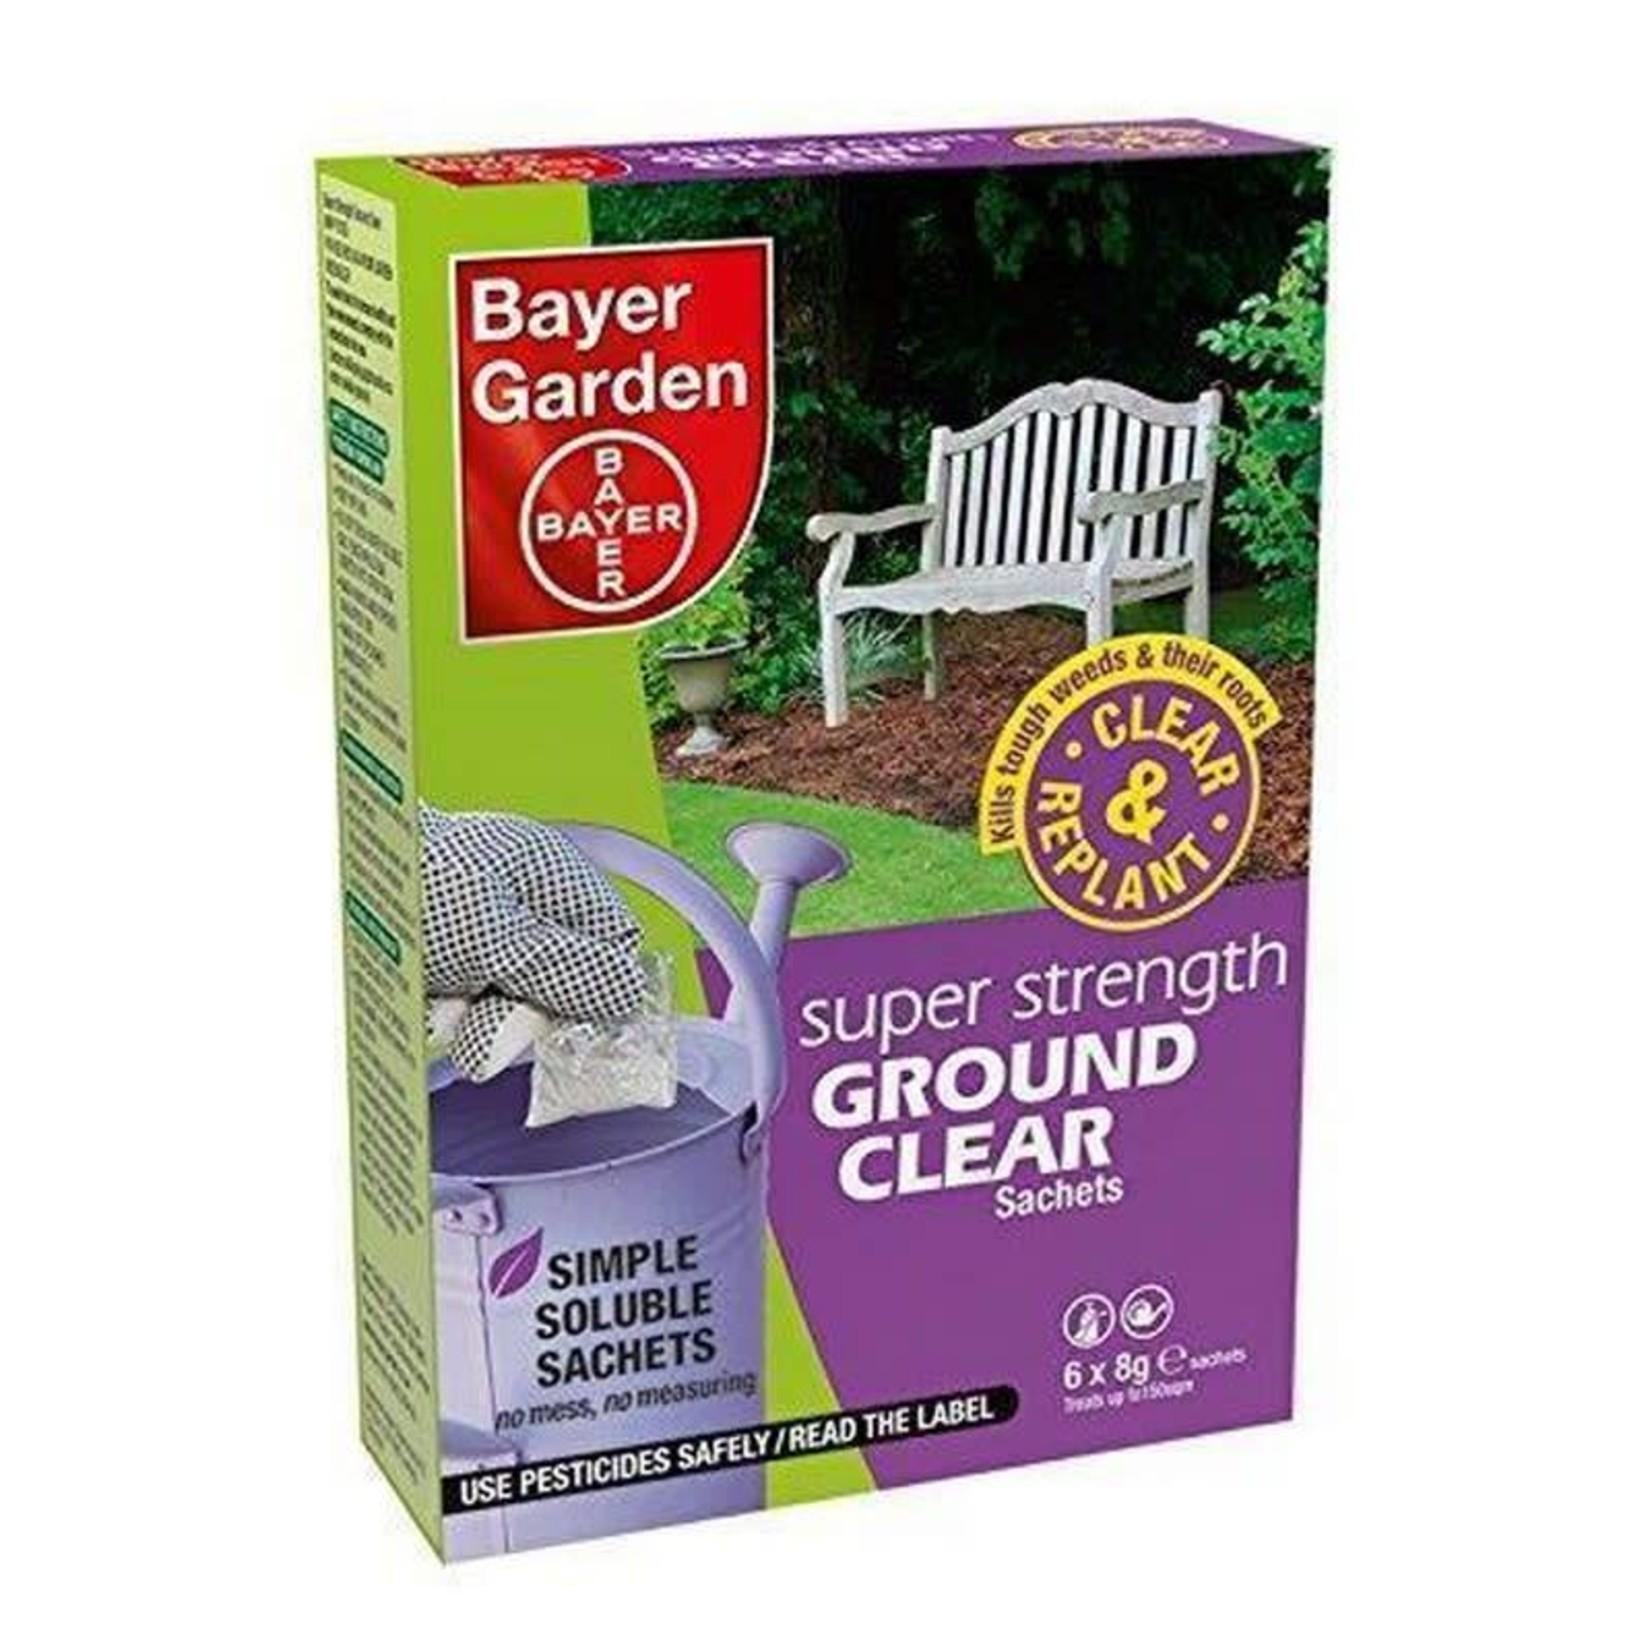 Bayer Garden BAYER GARDEN SUPER STRENGTH GROUND CLEAR SACHETS 6